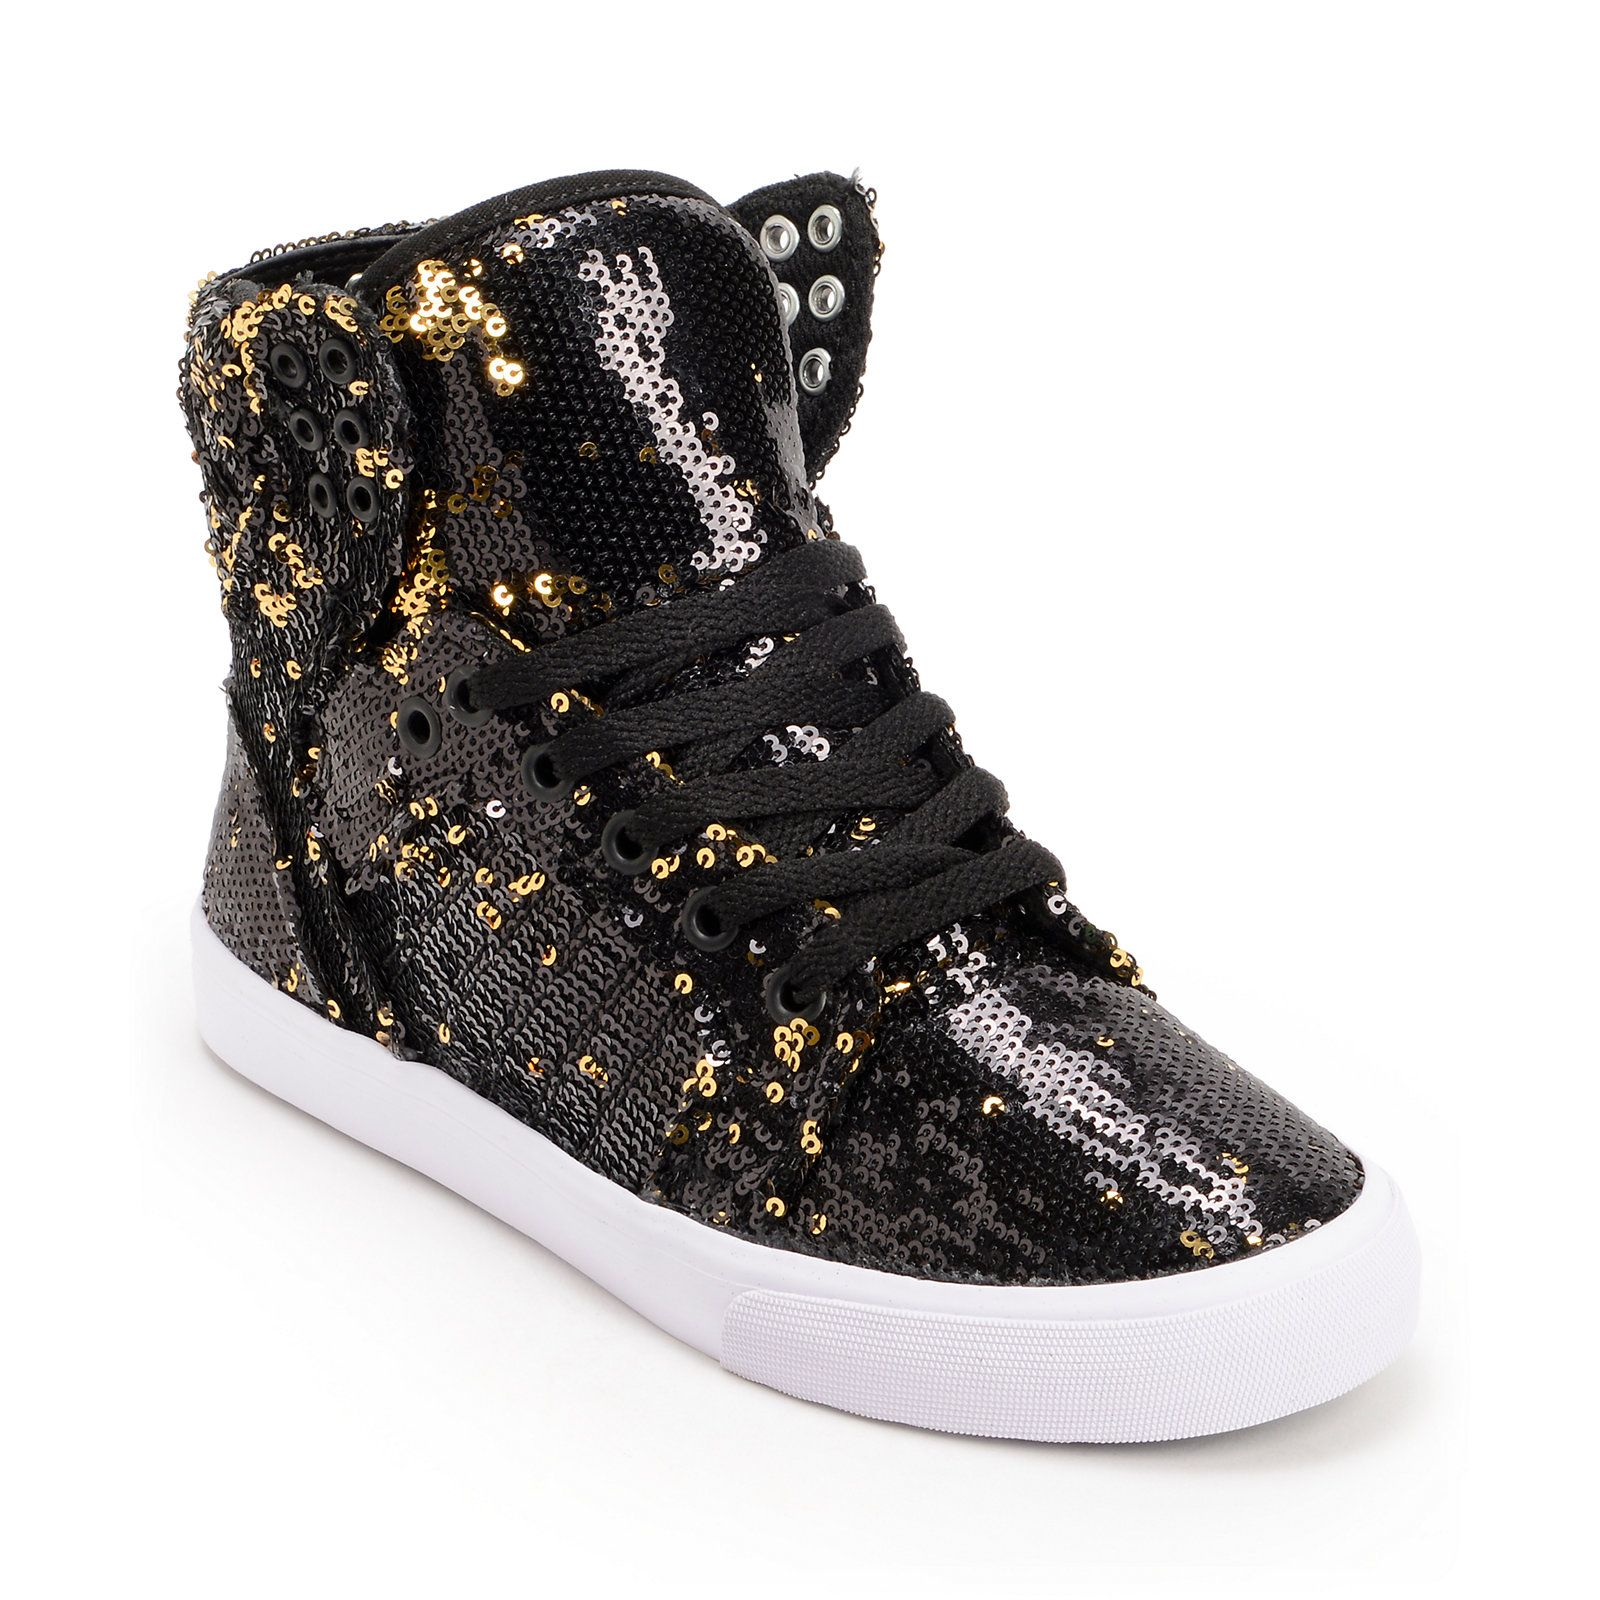 Supra x a-morir footwear sneakers collection